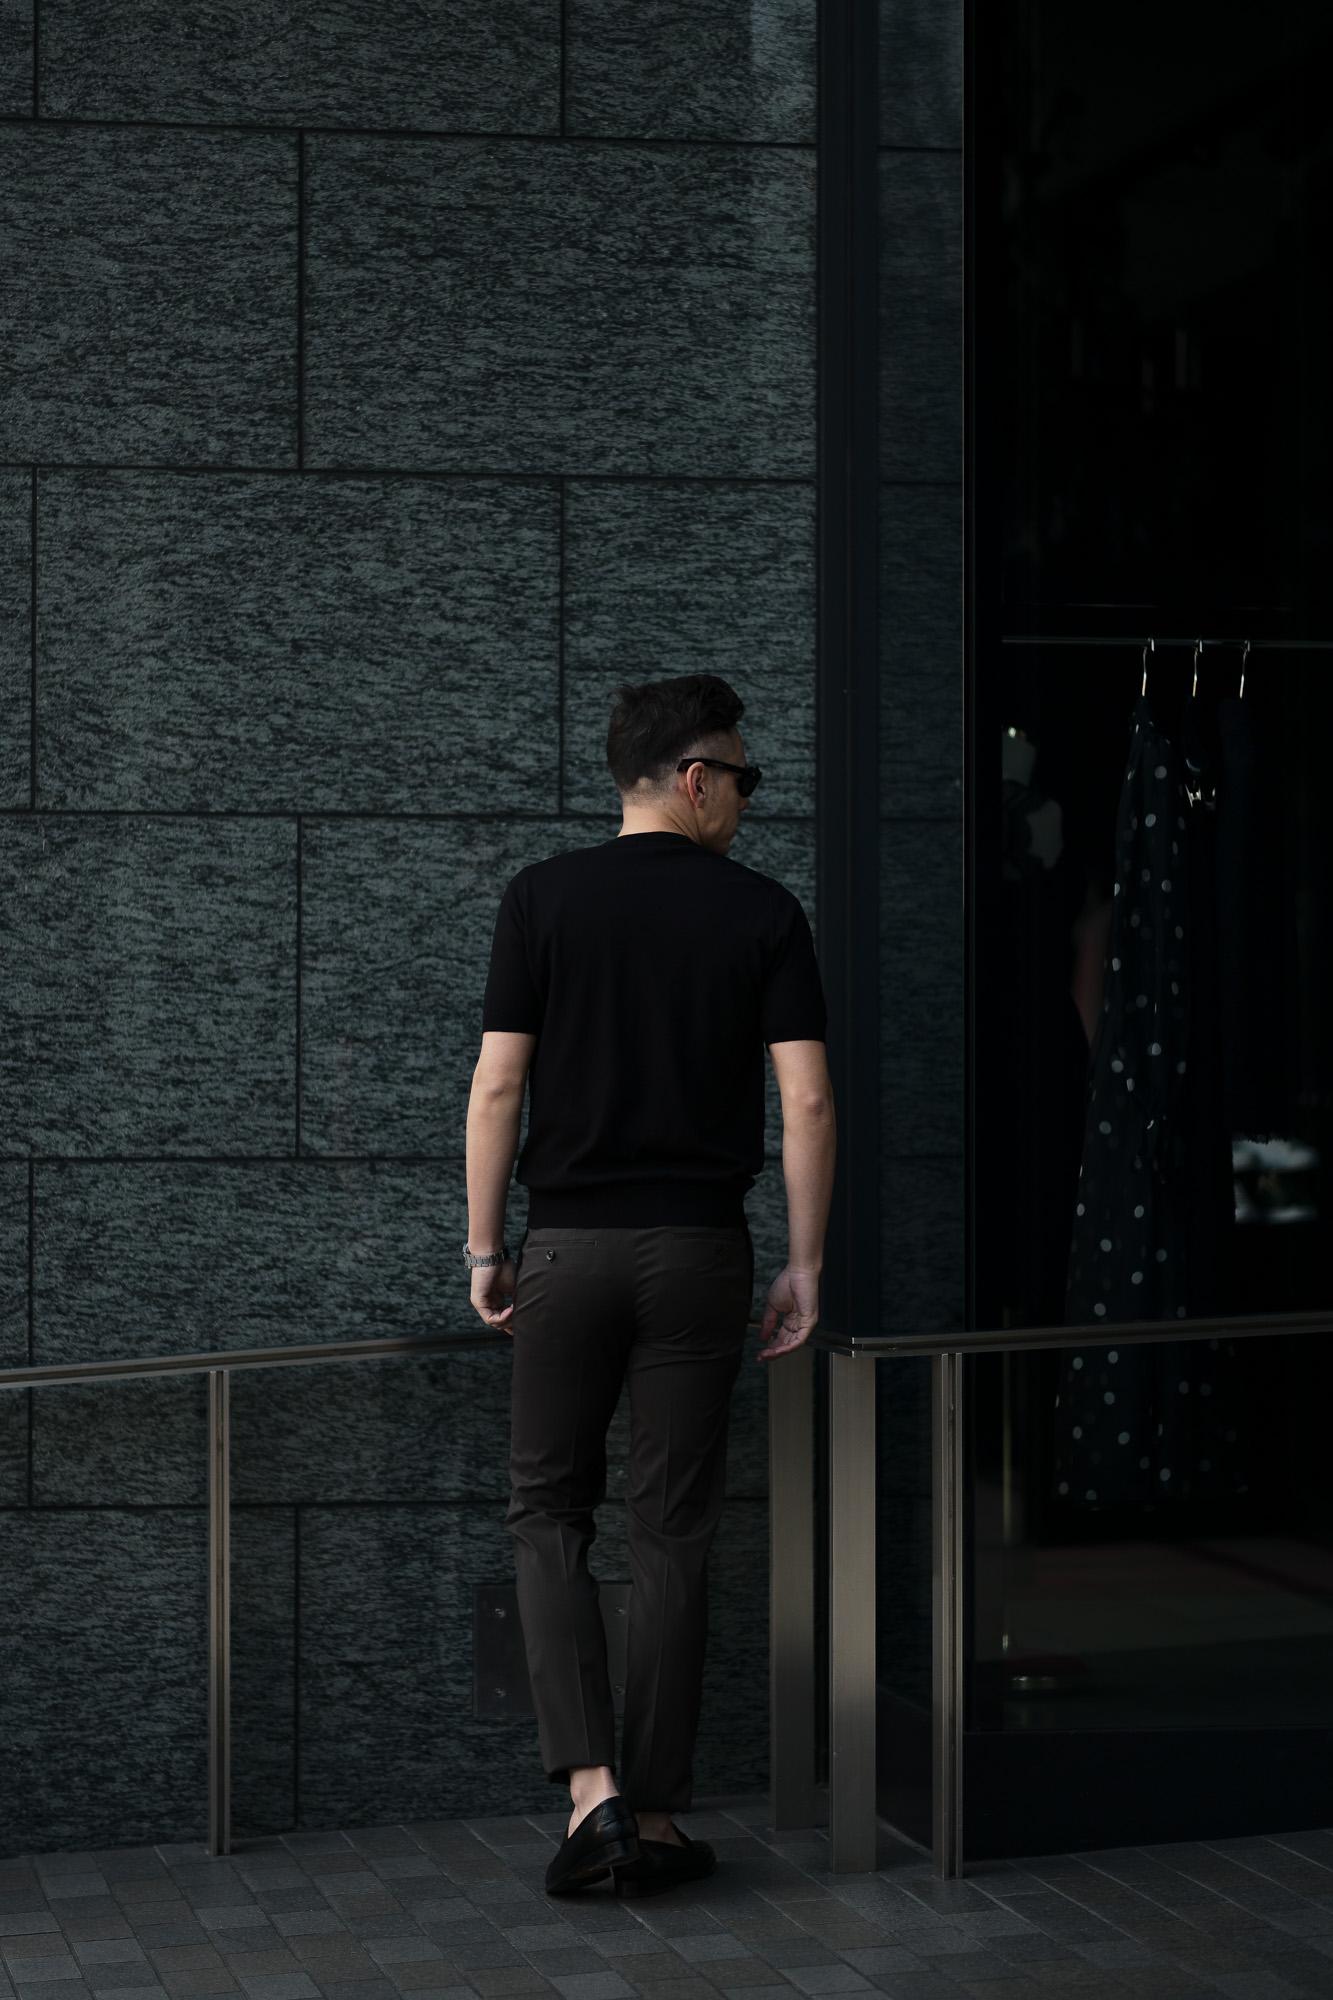 Cruciani(クルチアーニ) 33G Knit T-shirt 33ゲージ コットン ニット Tシャツ BLACK (ブラック・Z0048)  made in italy (イタリア製) 2020 春夏新作 愛知 名古屋 altoediritto アルトエデリット ニットTEE